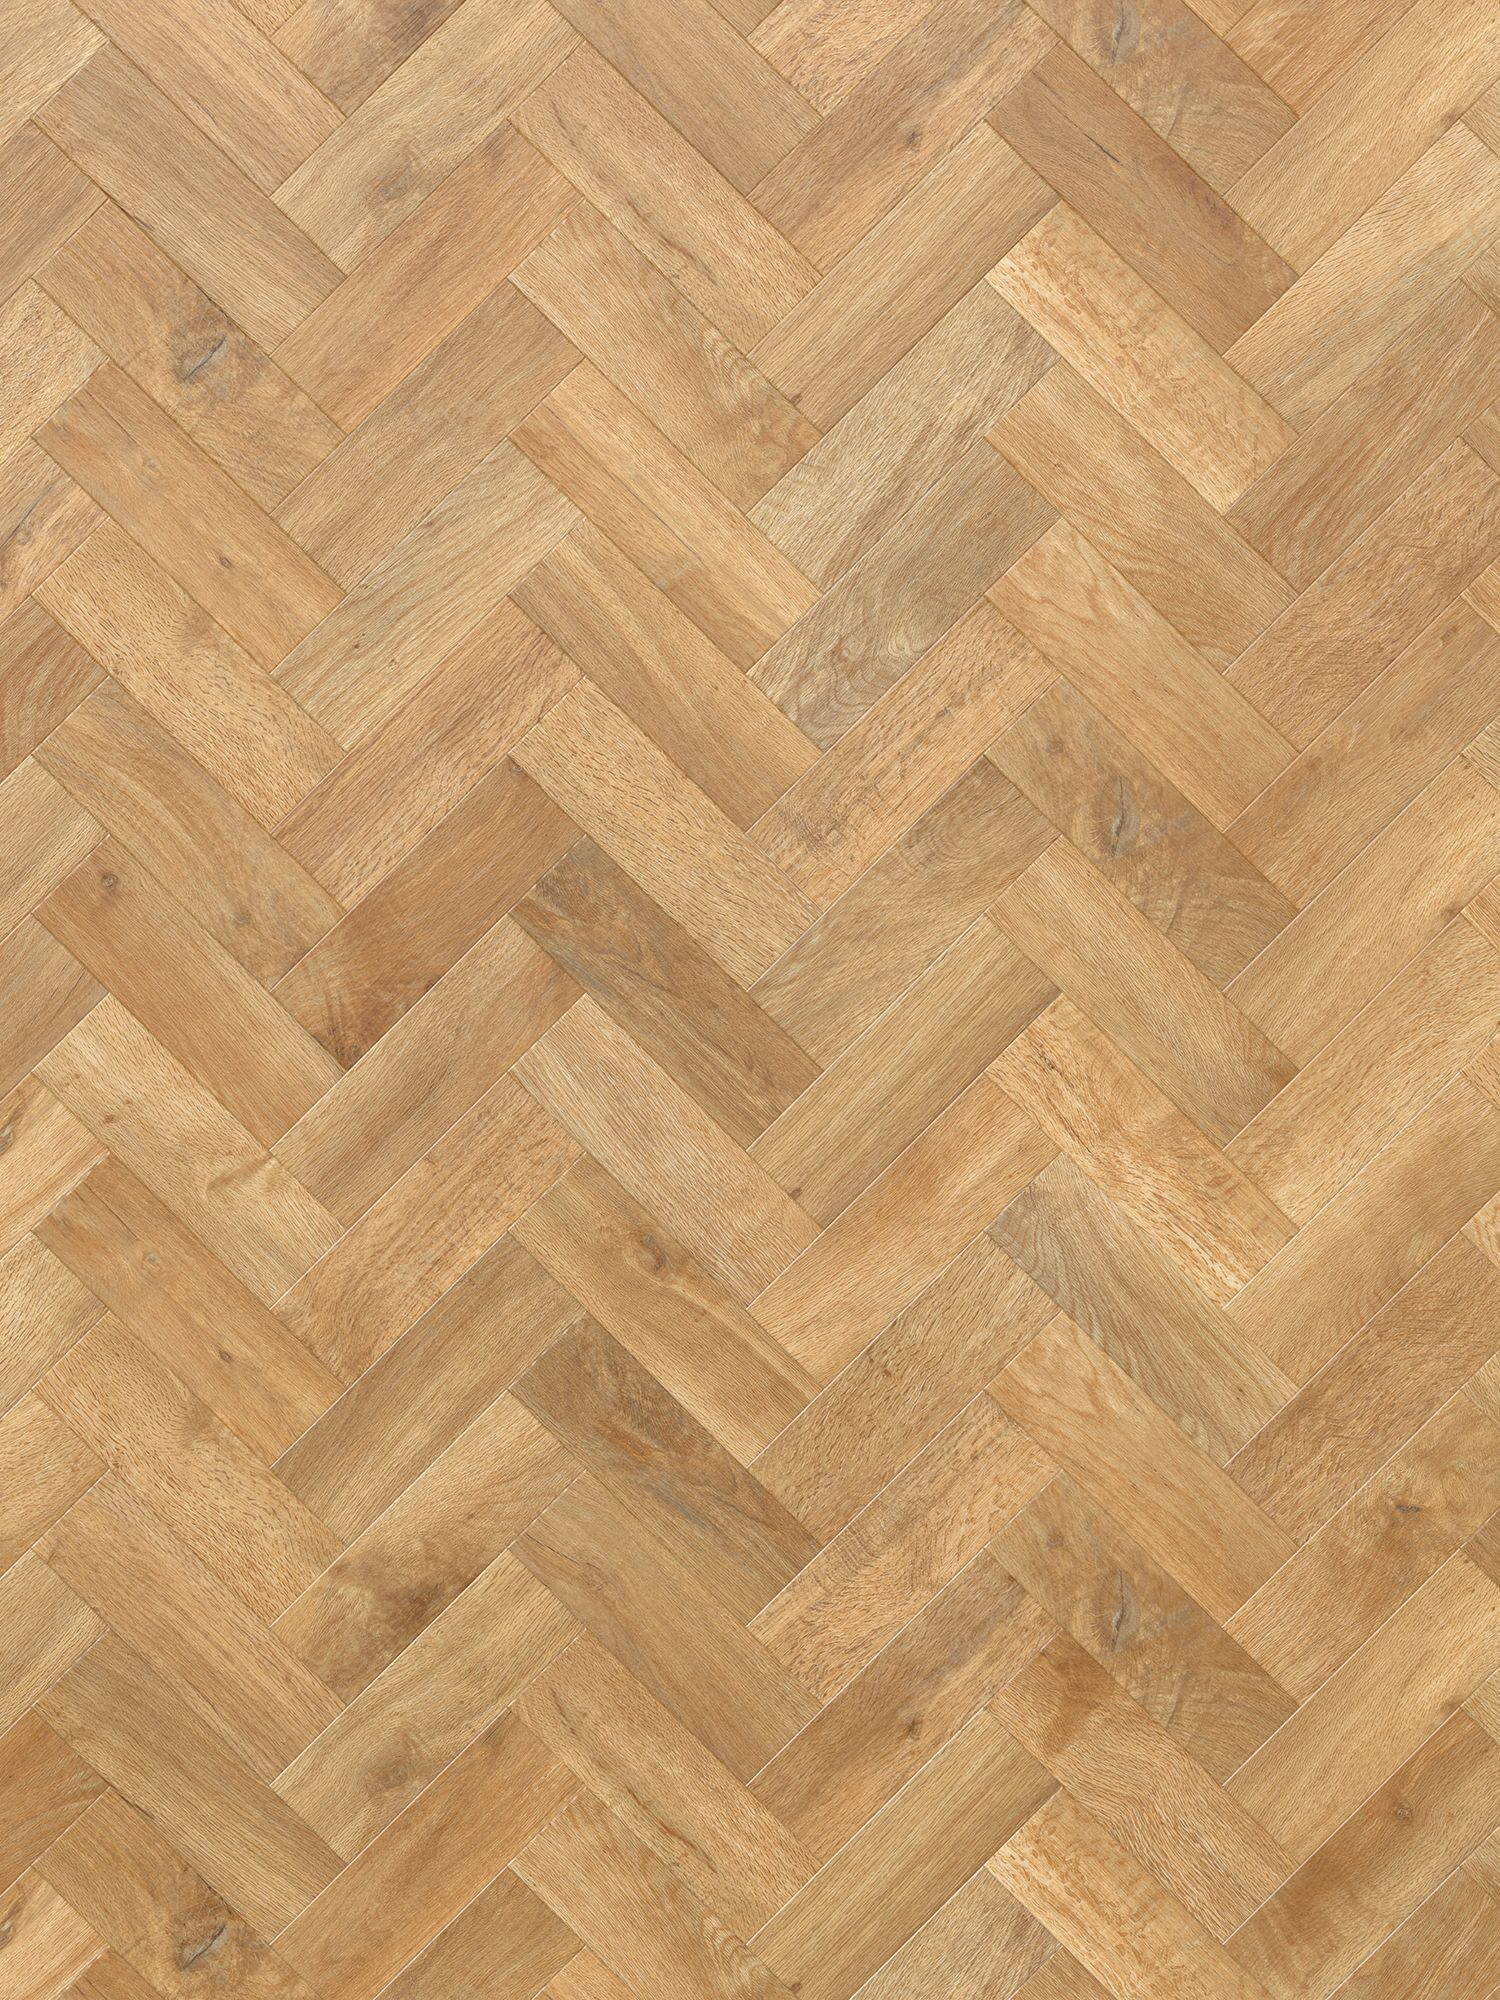 Karndean Karndean Art Select Luxury Vinyl Tile Wood Parquet Flooring